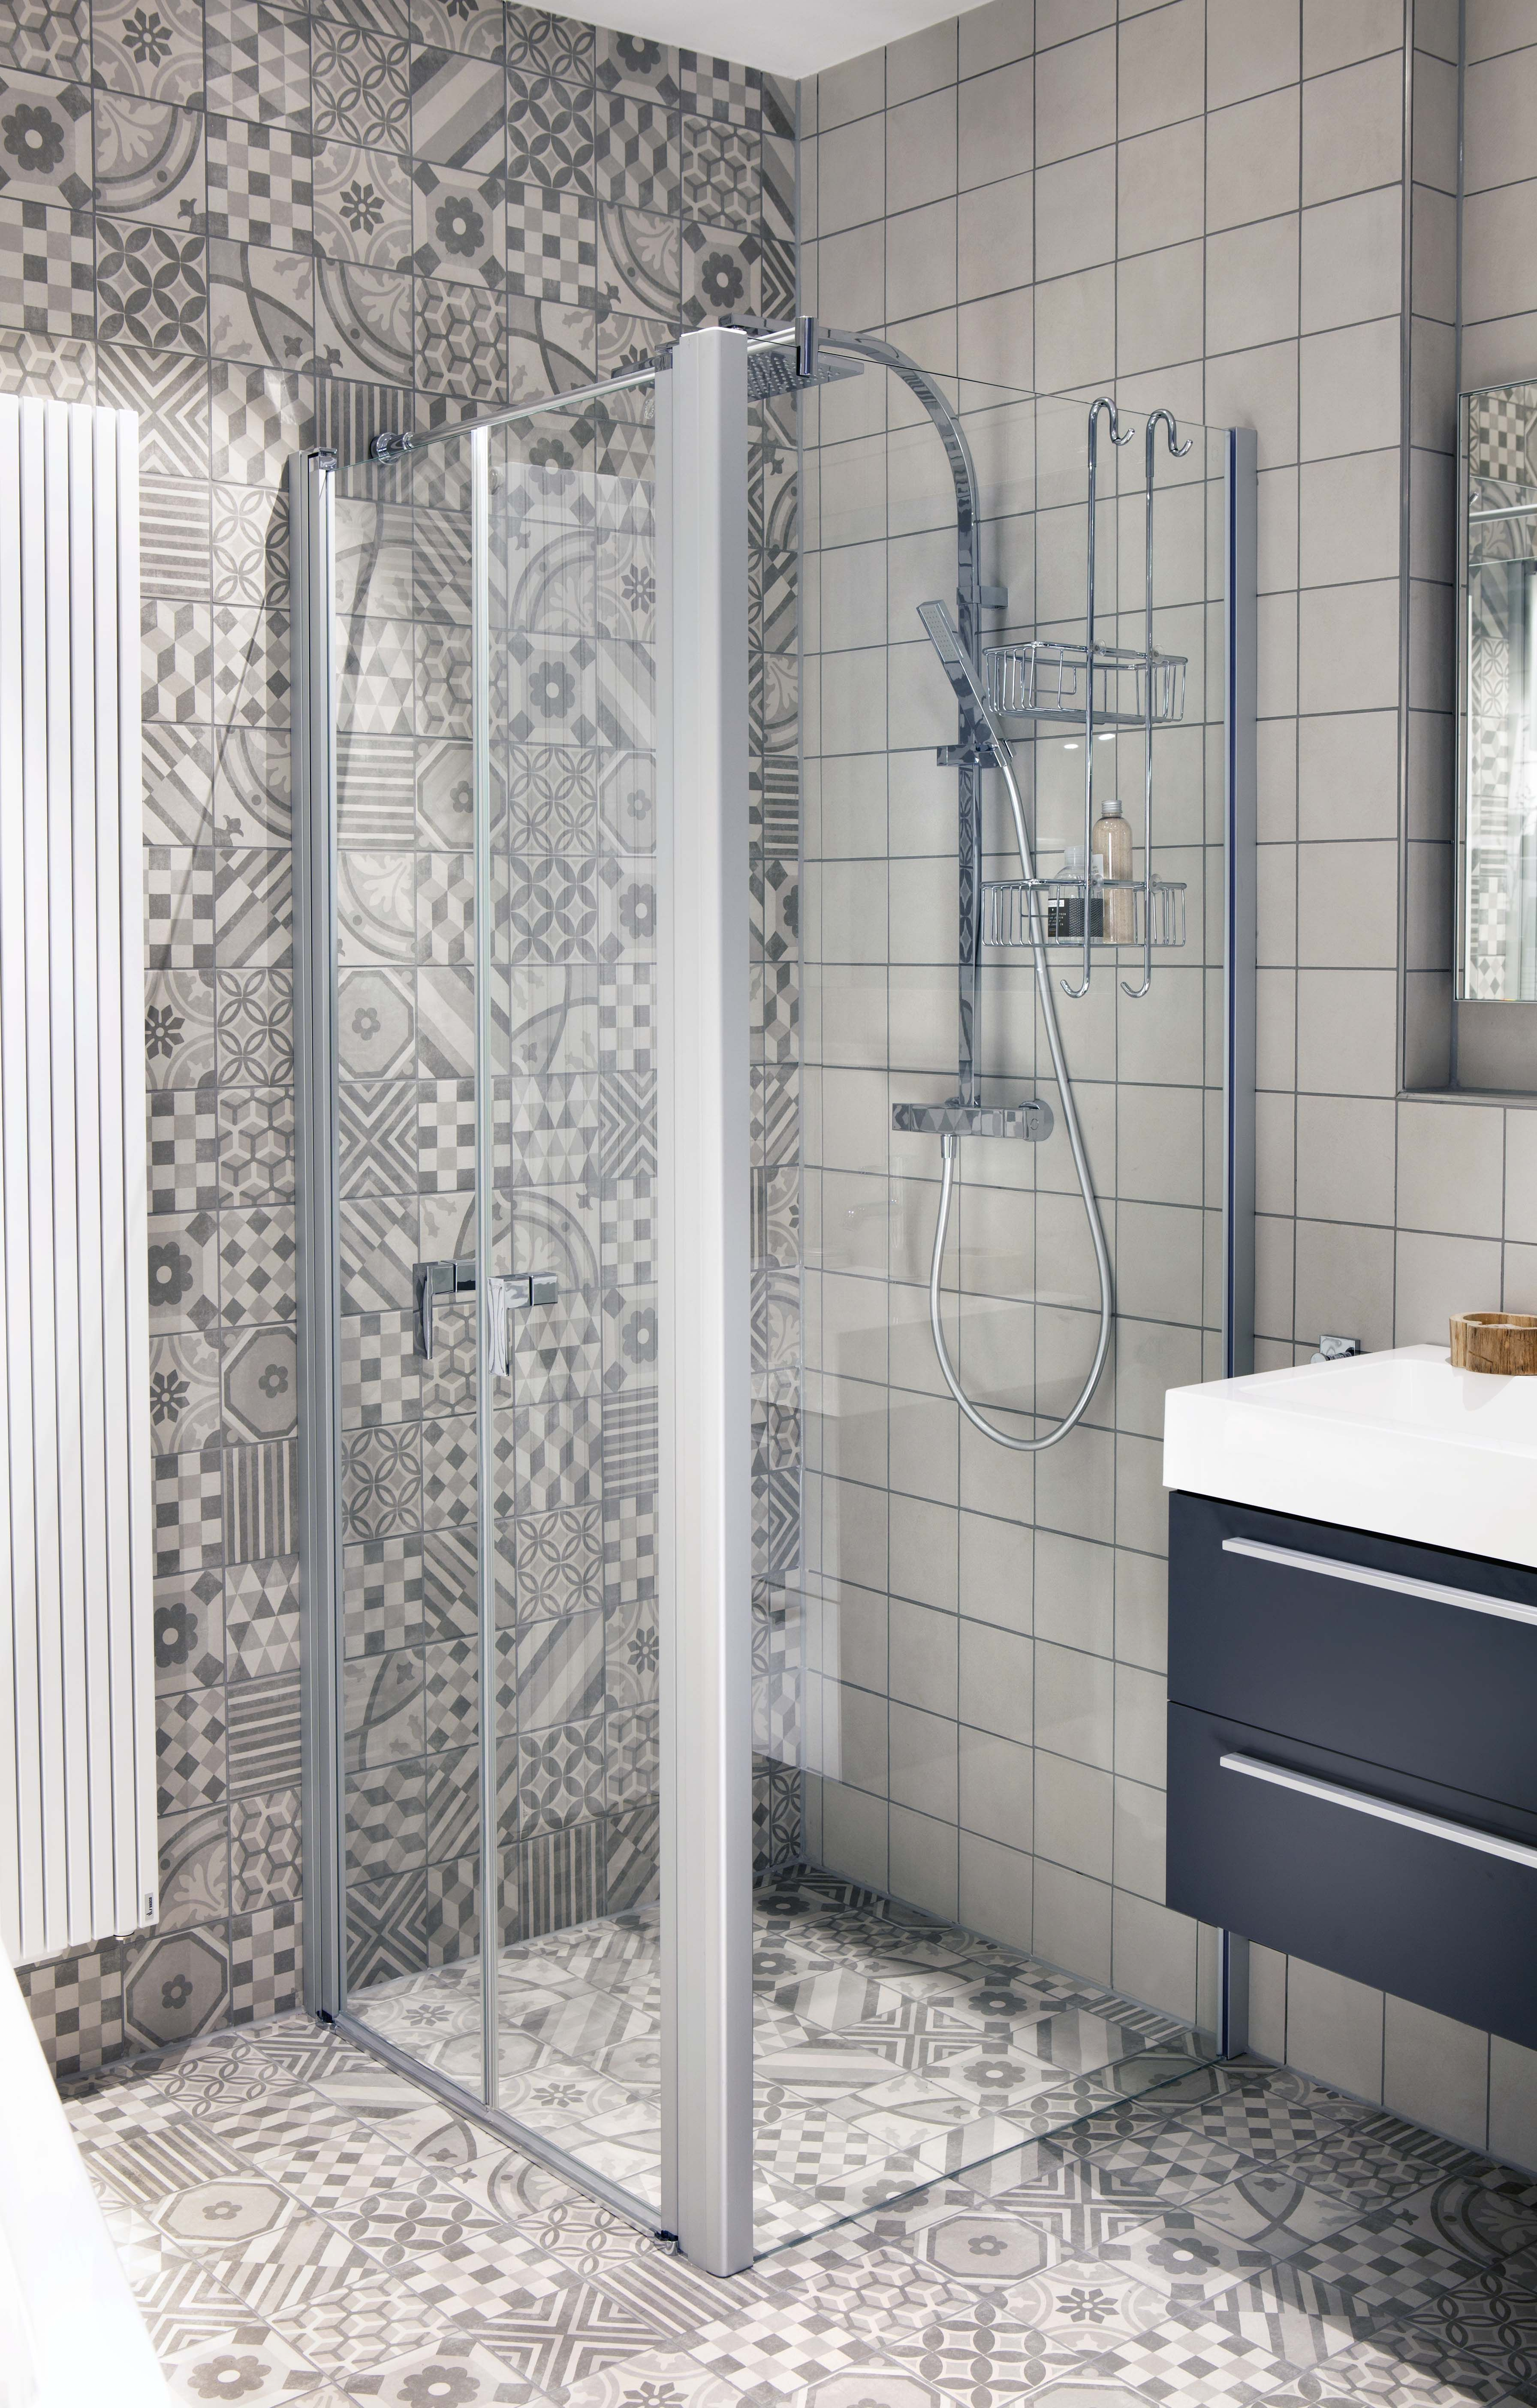 Compacte douche met glazen wand.   Kleine badkamer   Pinterest ...